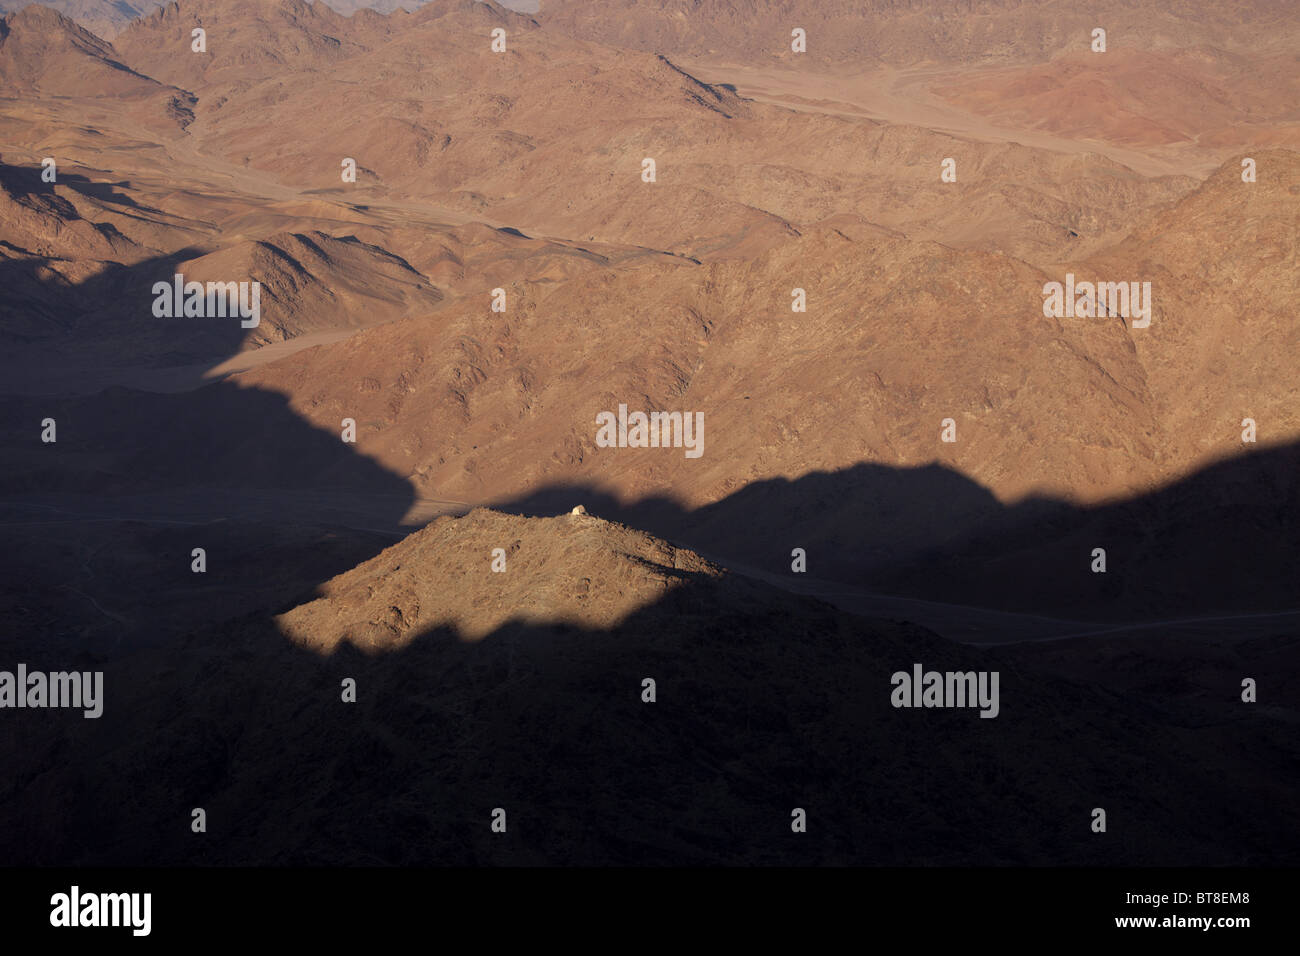 Djebel Musa or Mount Sinai near Saint Katherine or El Miga village, Sinai, Egypt, Africa, - Stock Image